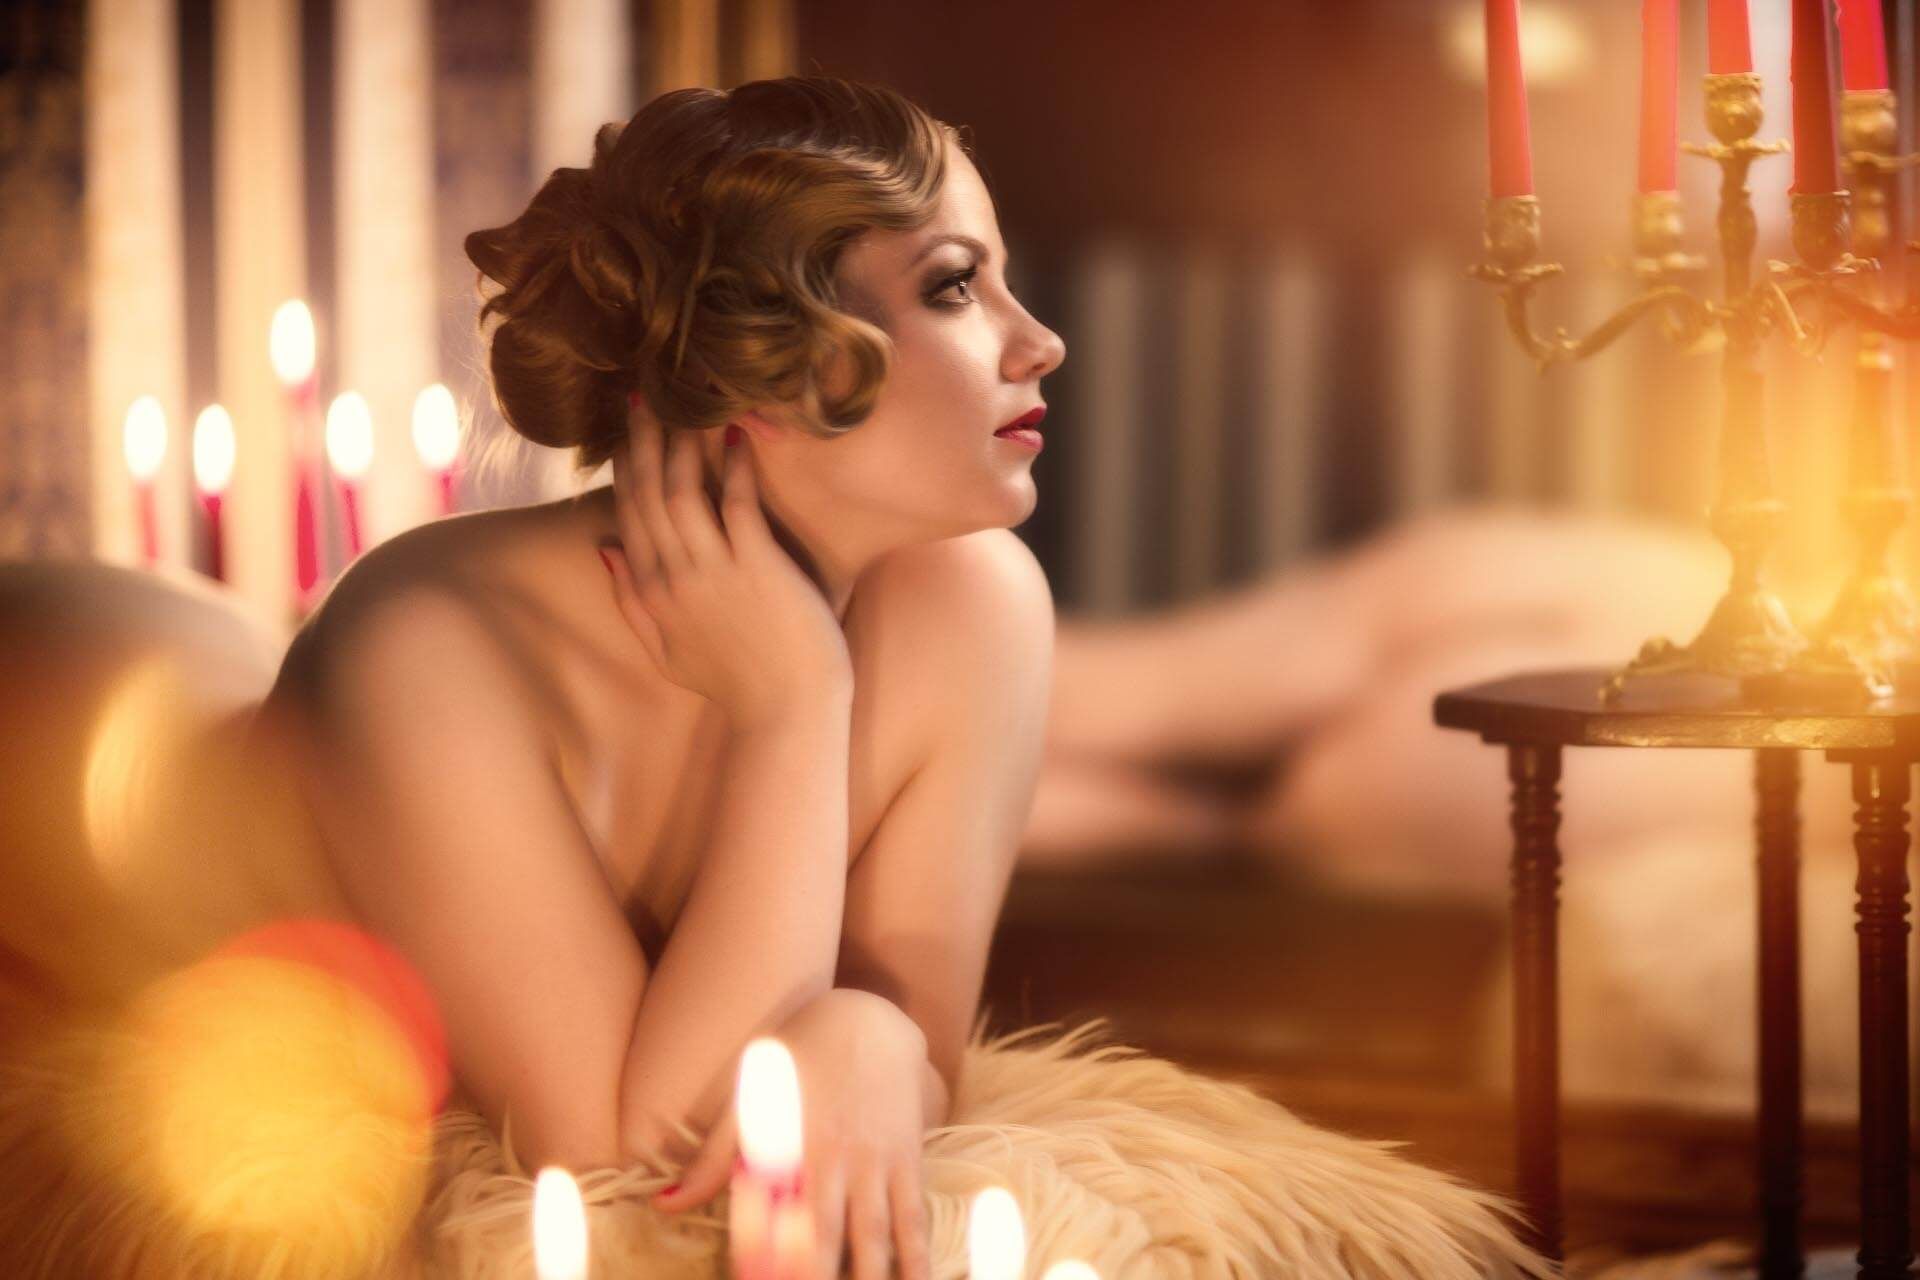 Fotostudio-Dresden-Fotograf-20iger Jahre-Kerzen-Candles-Akt